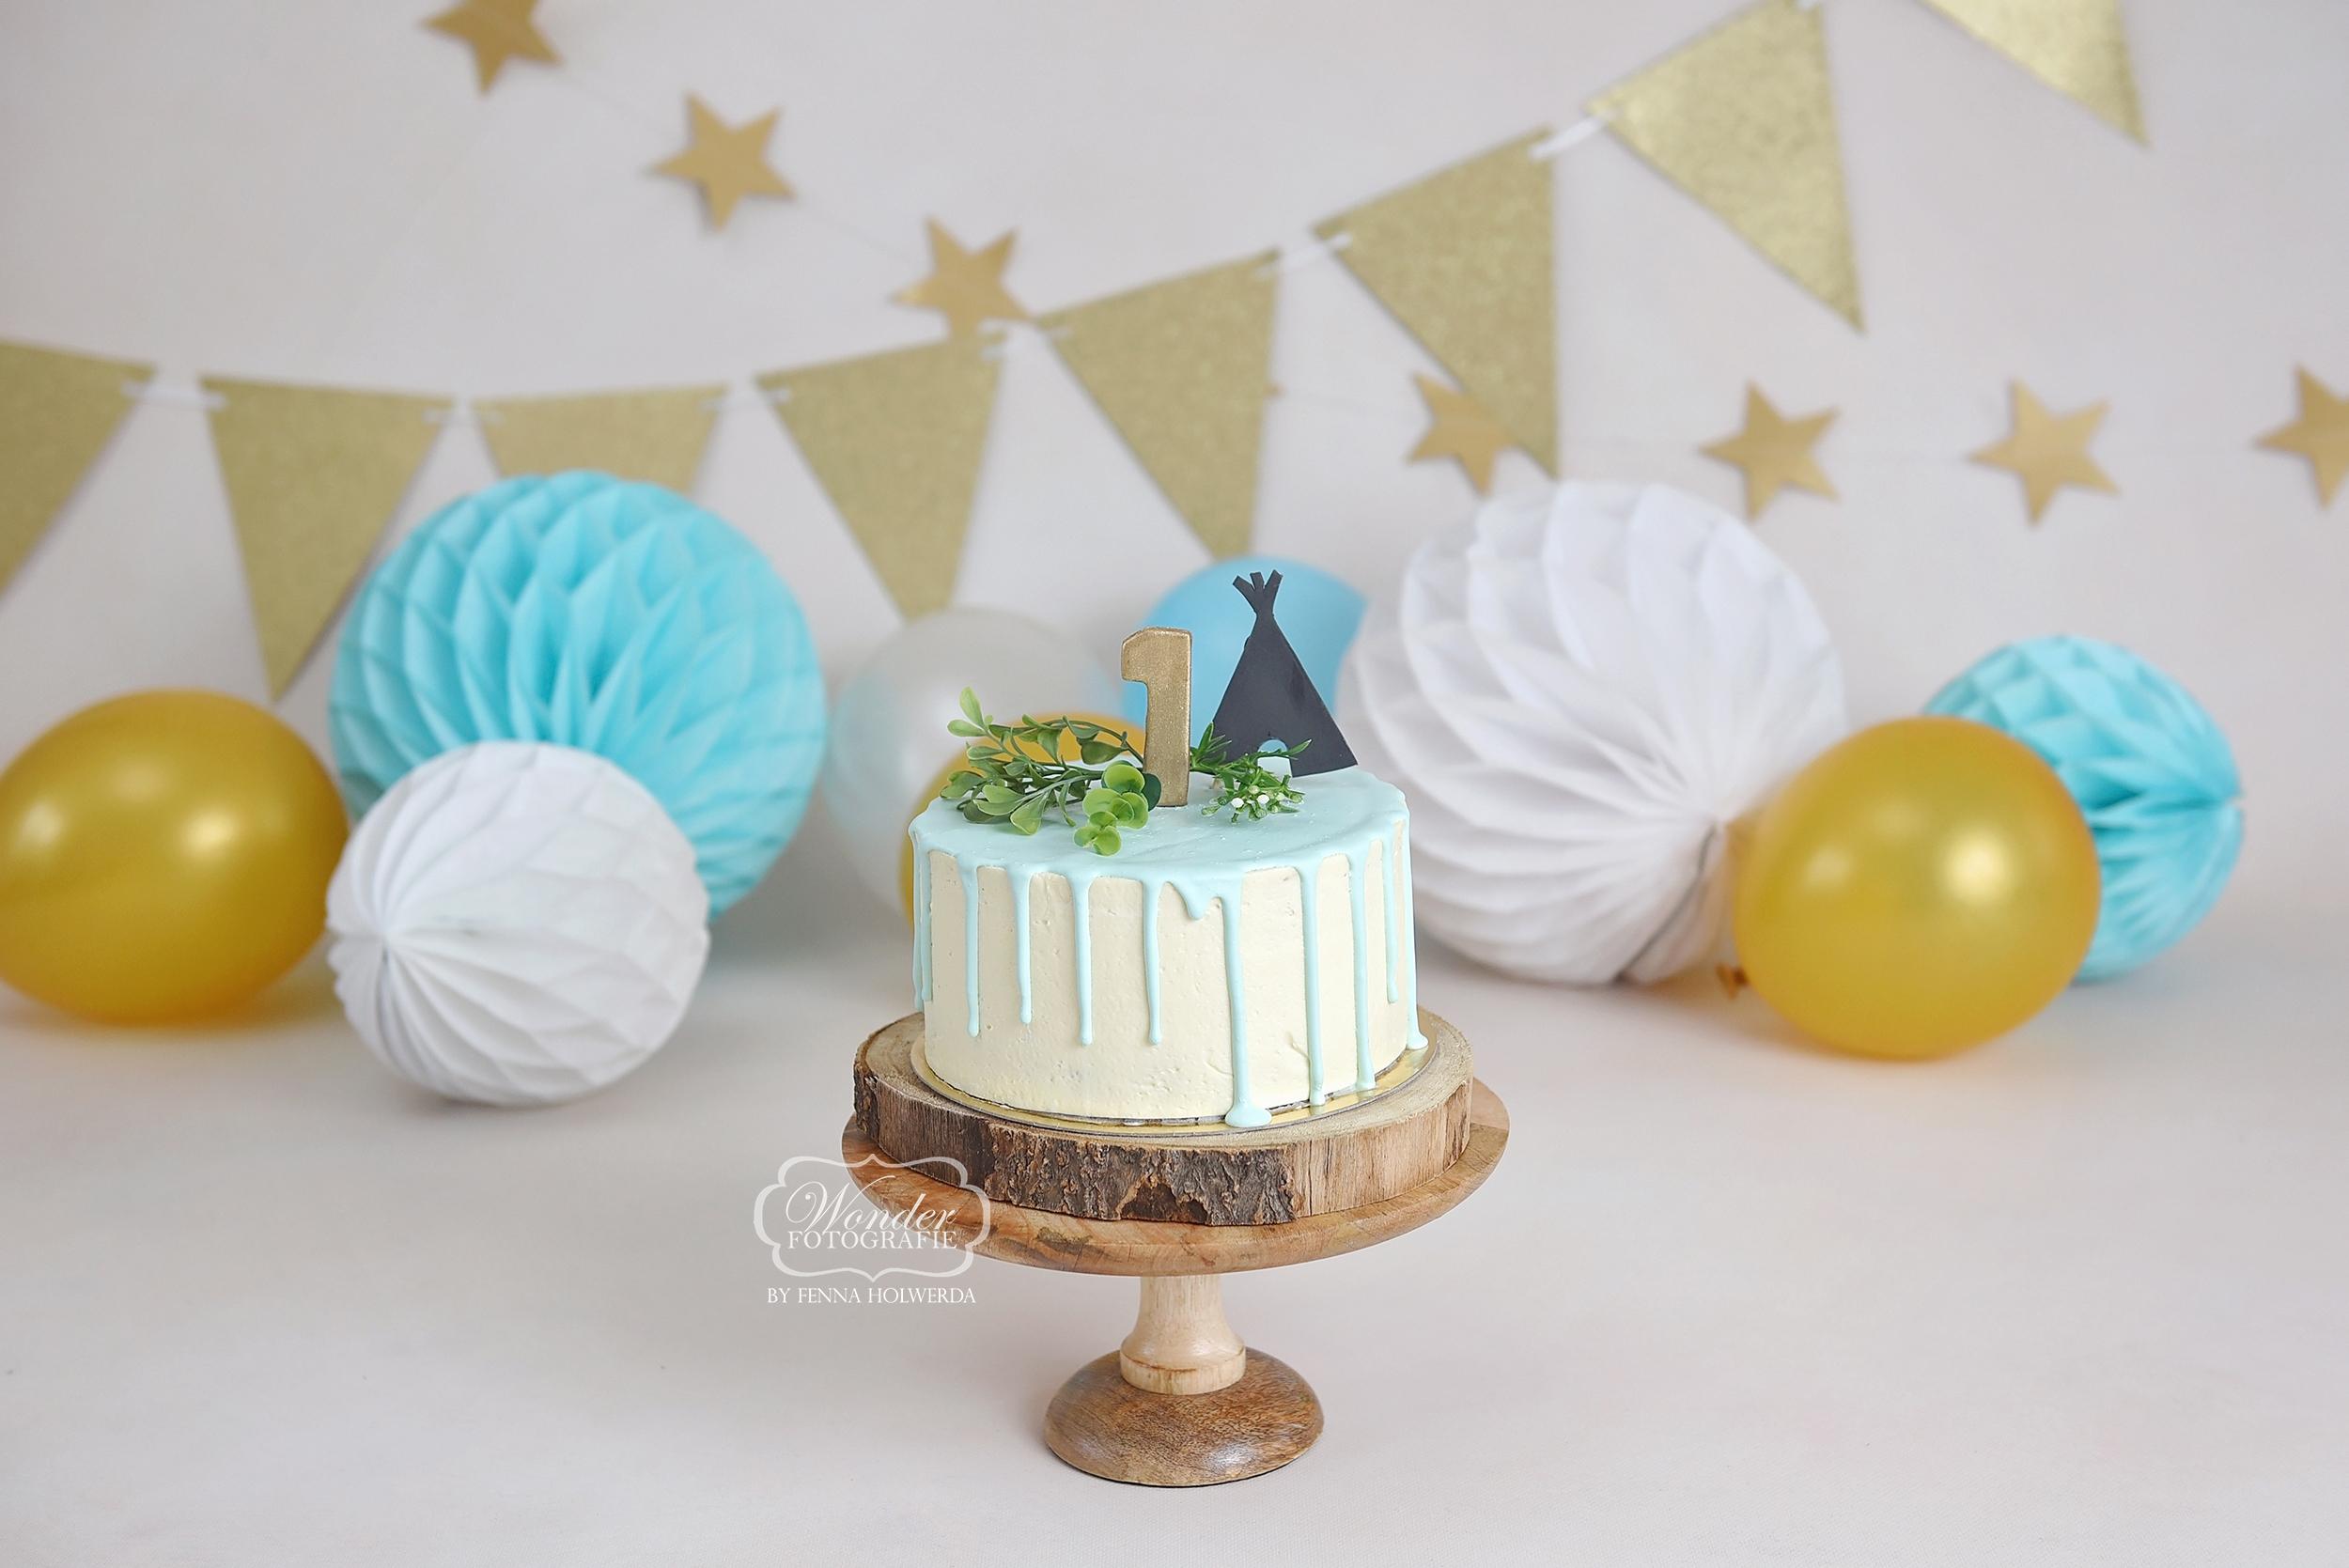 lichtblauw dripcake tipi tent goud cake smash fotoshoot